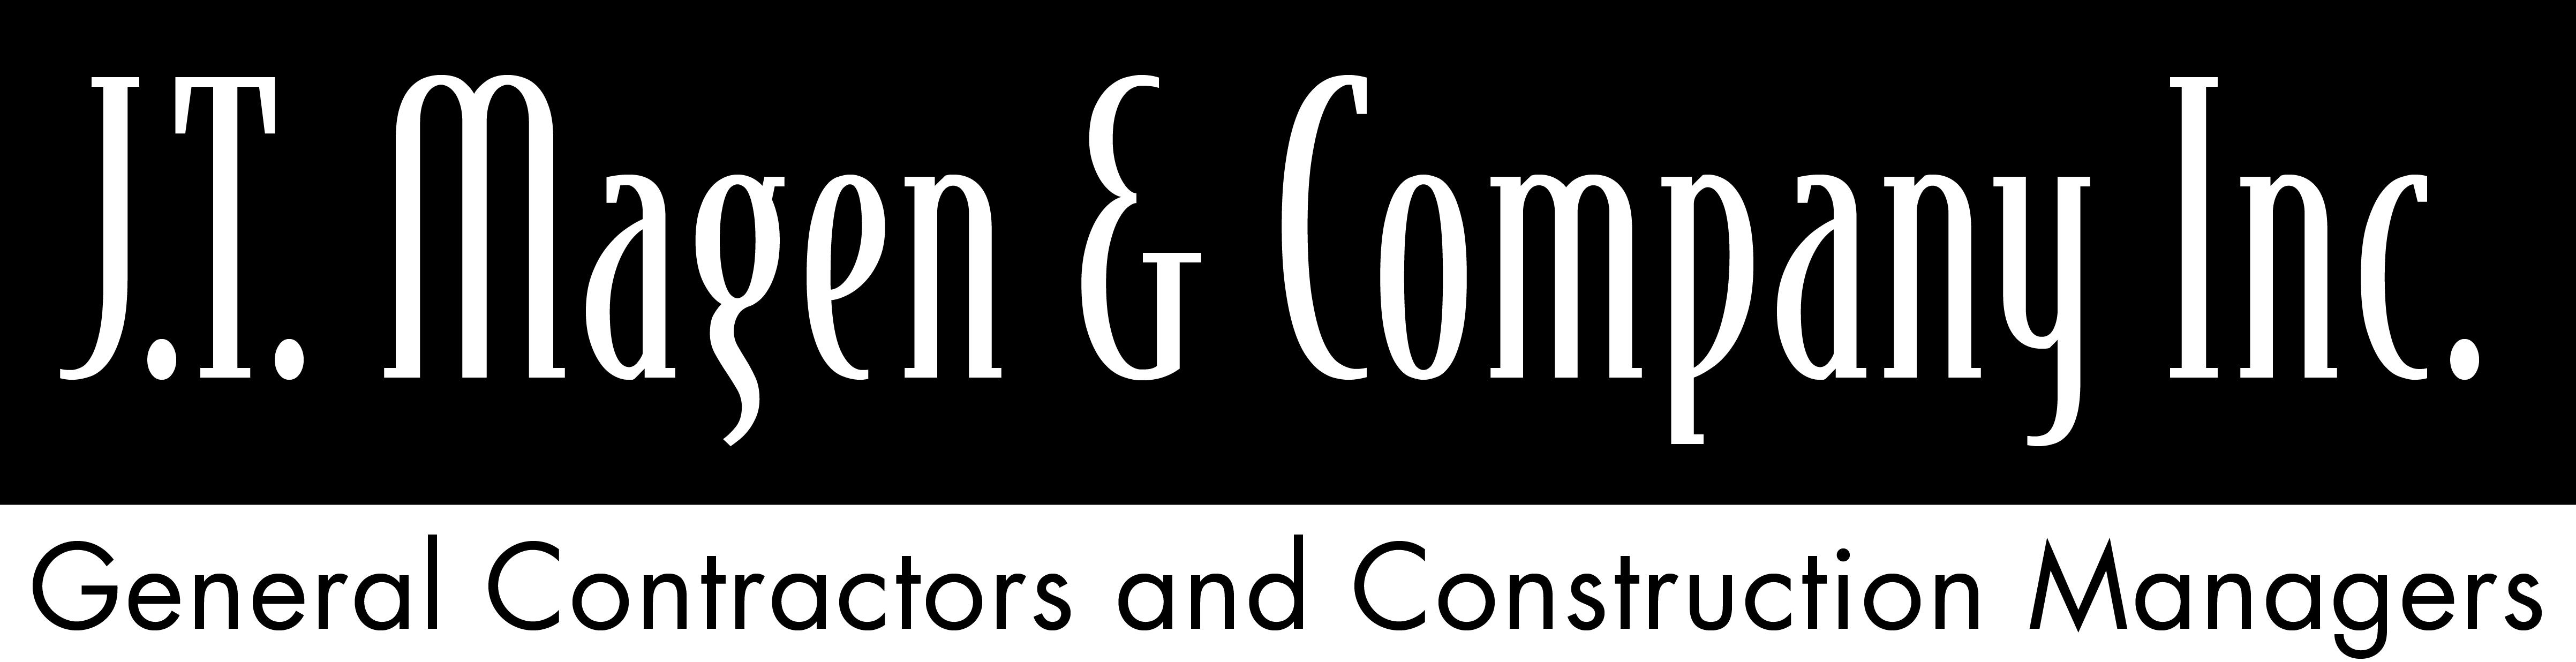 J T  Magen & Company Inc  - Services Directory